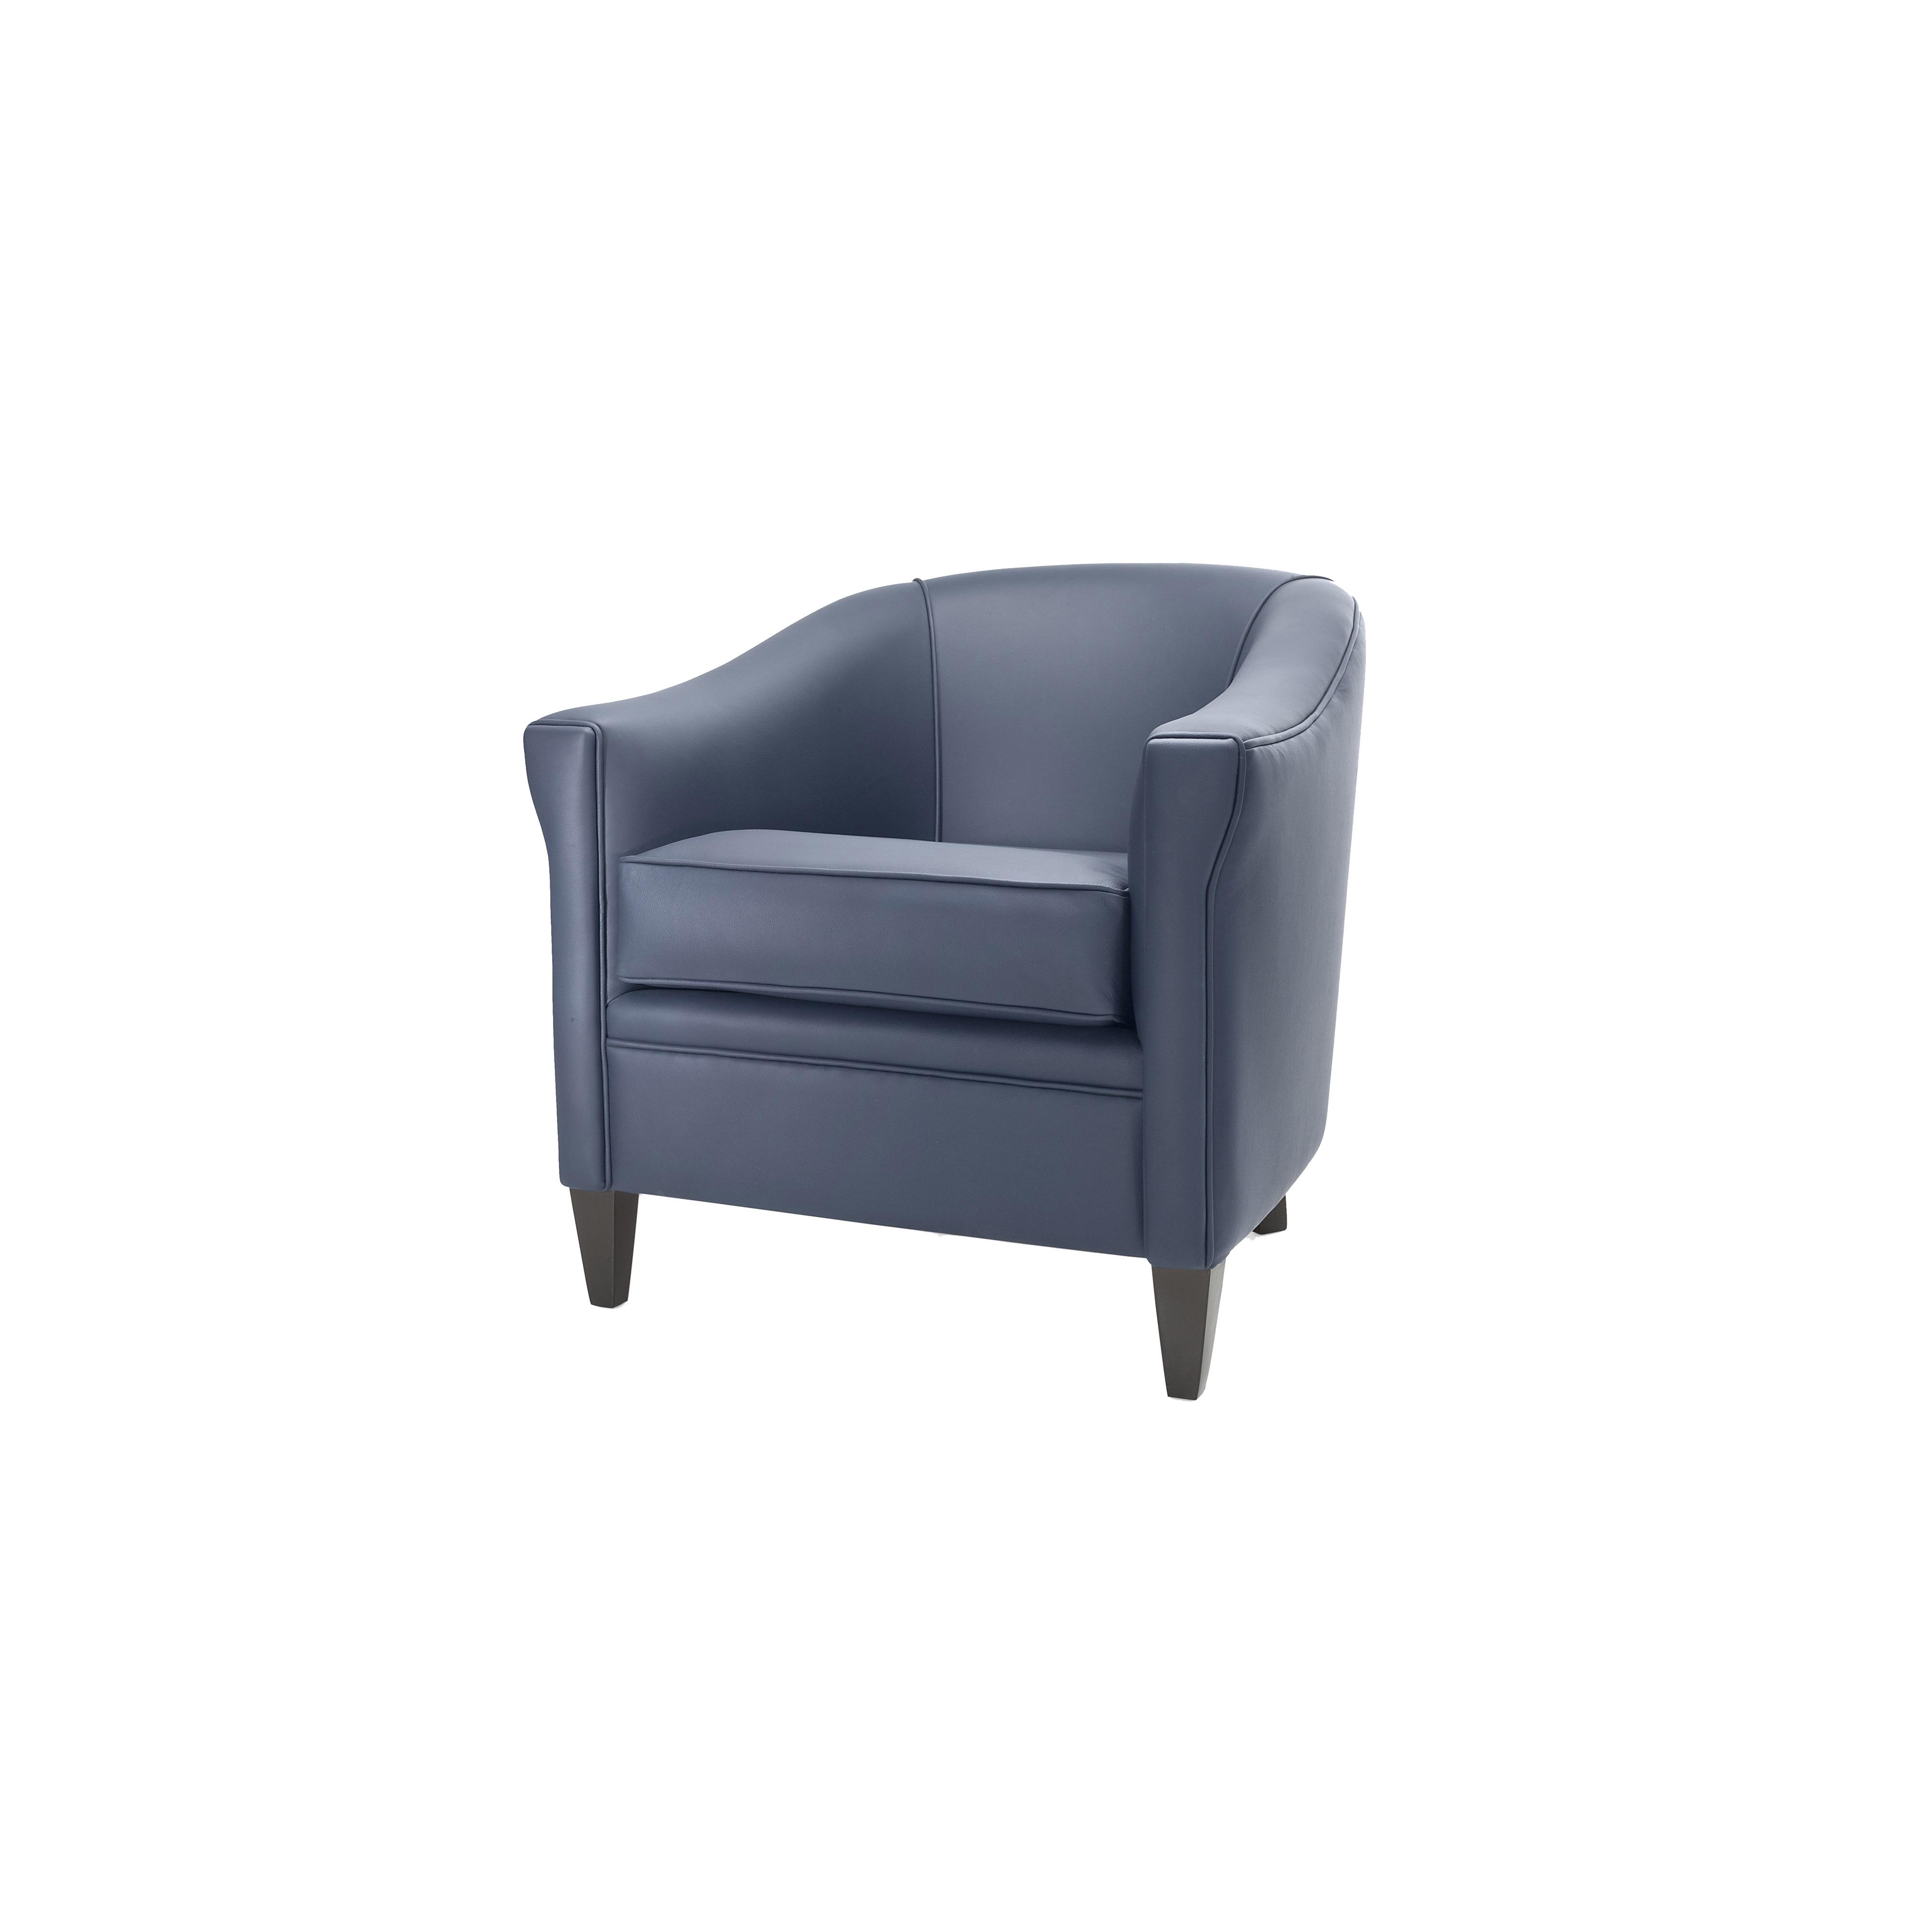 Duchess armchair